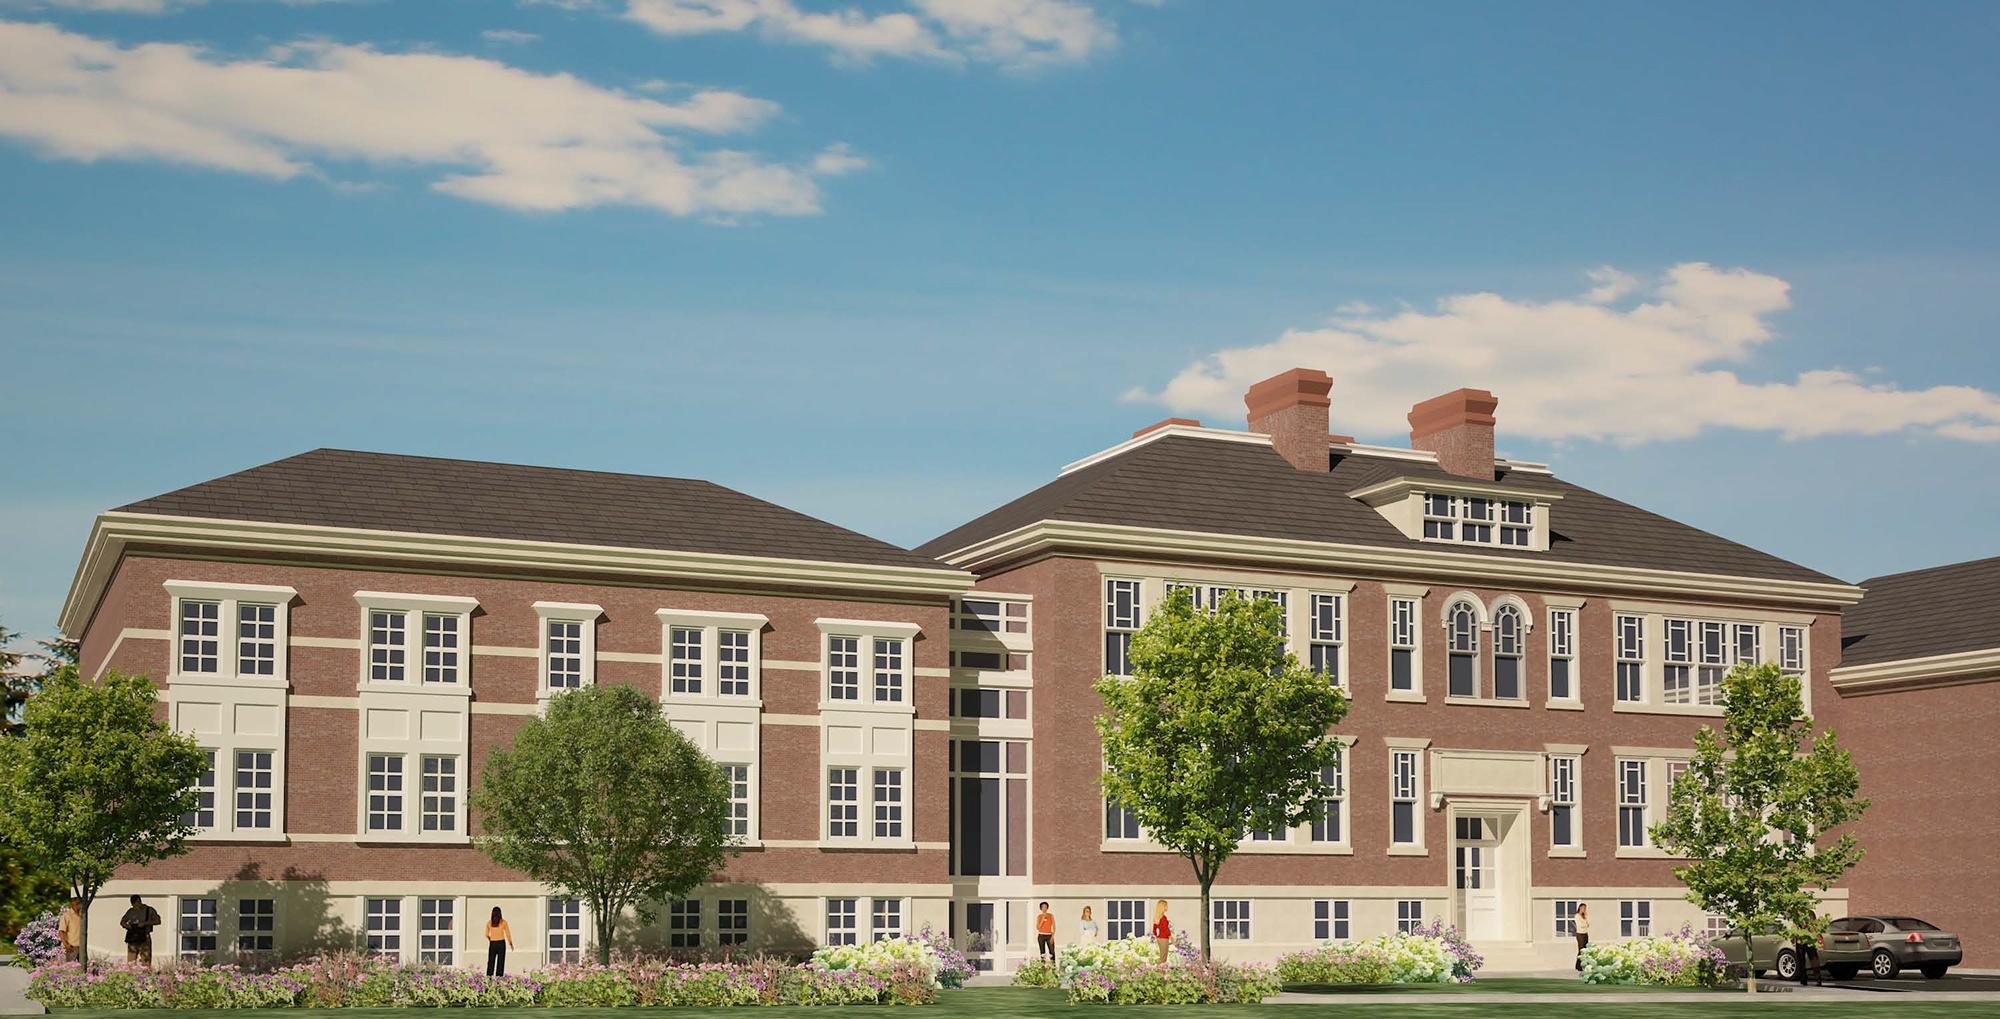 Salisbury Affordable Housing